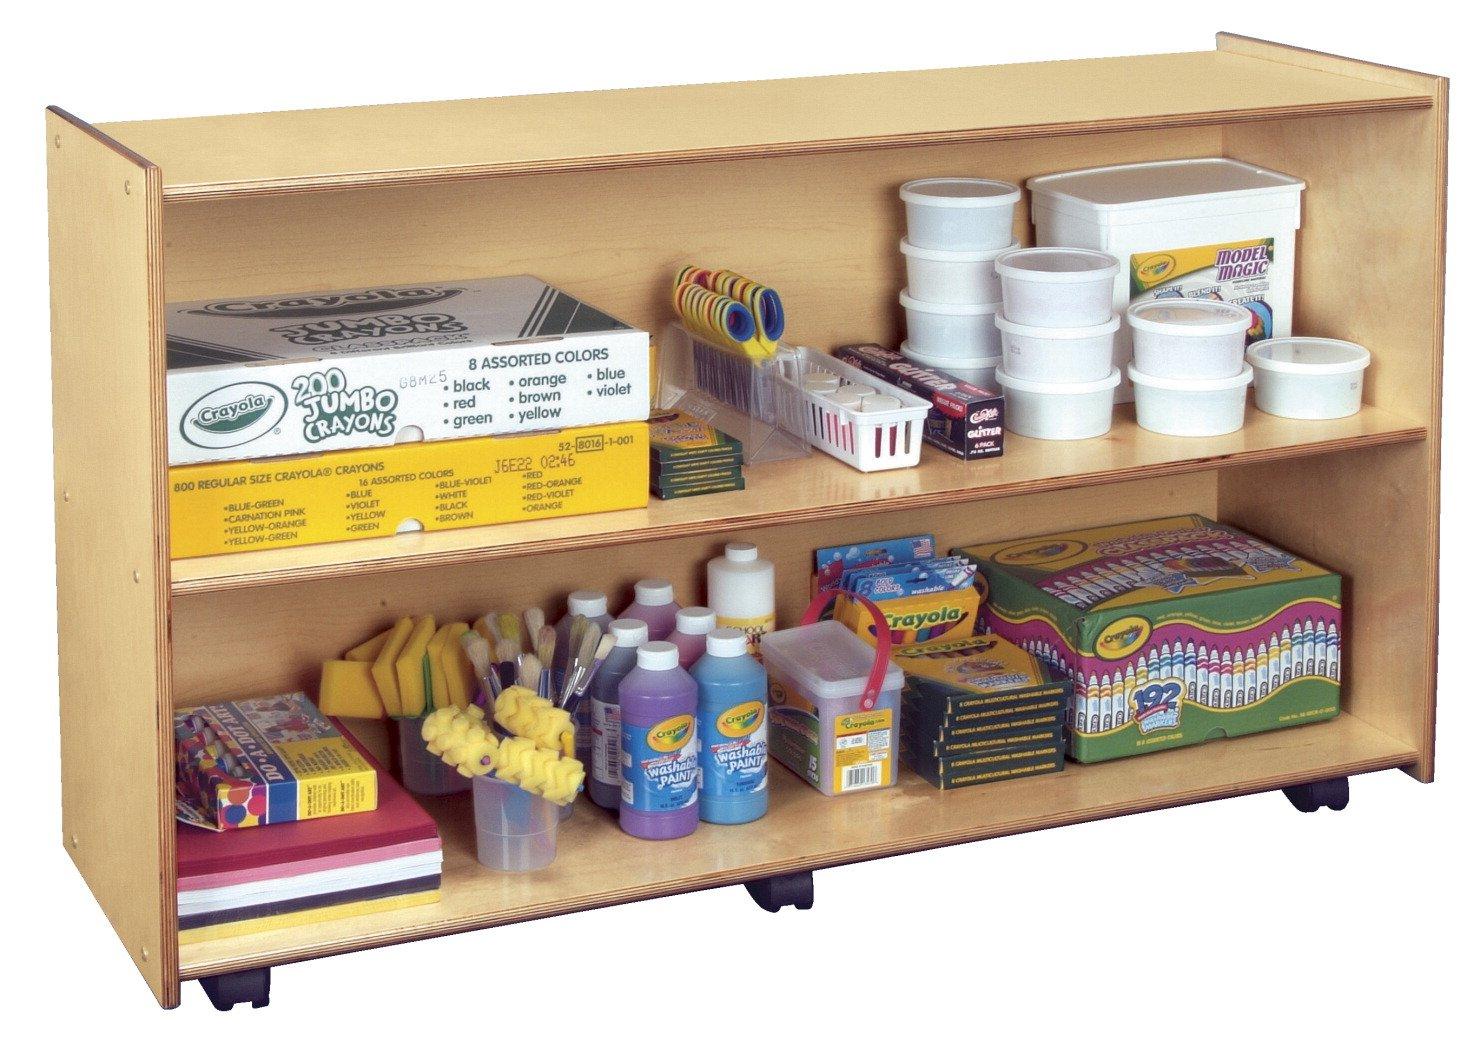 Childcraft 1301522 Mobile Open Shelving Unit, Birch Veneer Panel, 4-Coat UV Acrylic, 30'' x 48'' x 14-1/2'', Natural Wood Tone